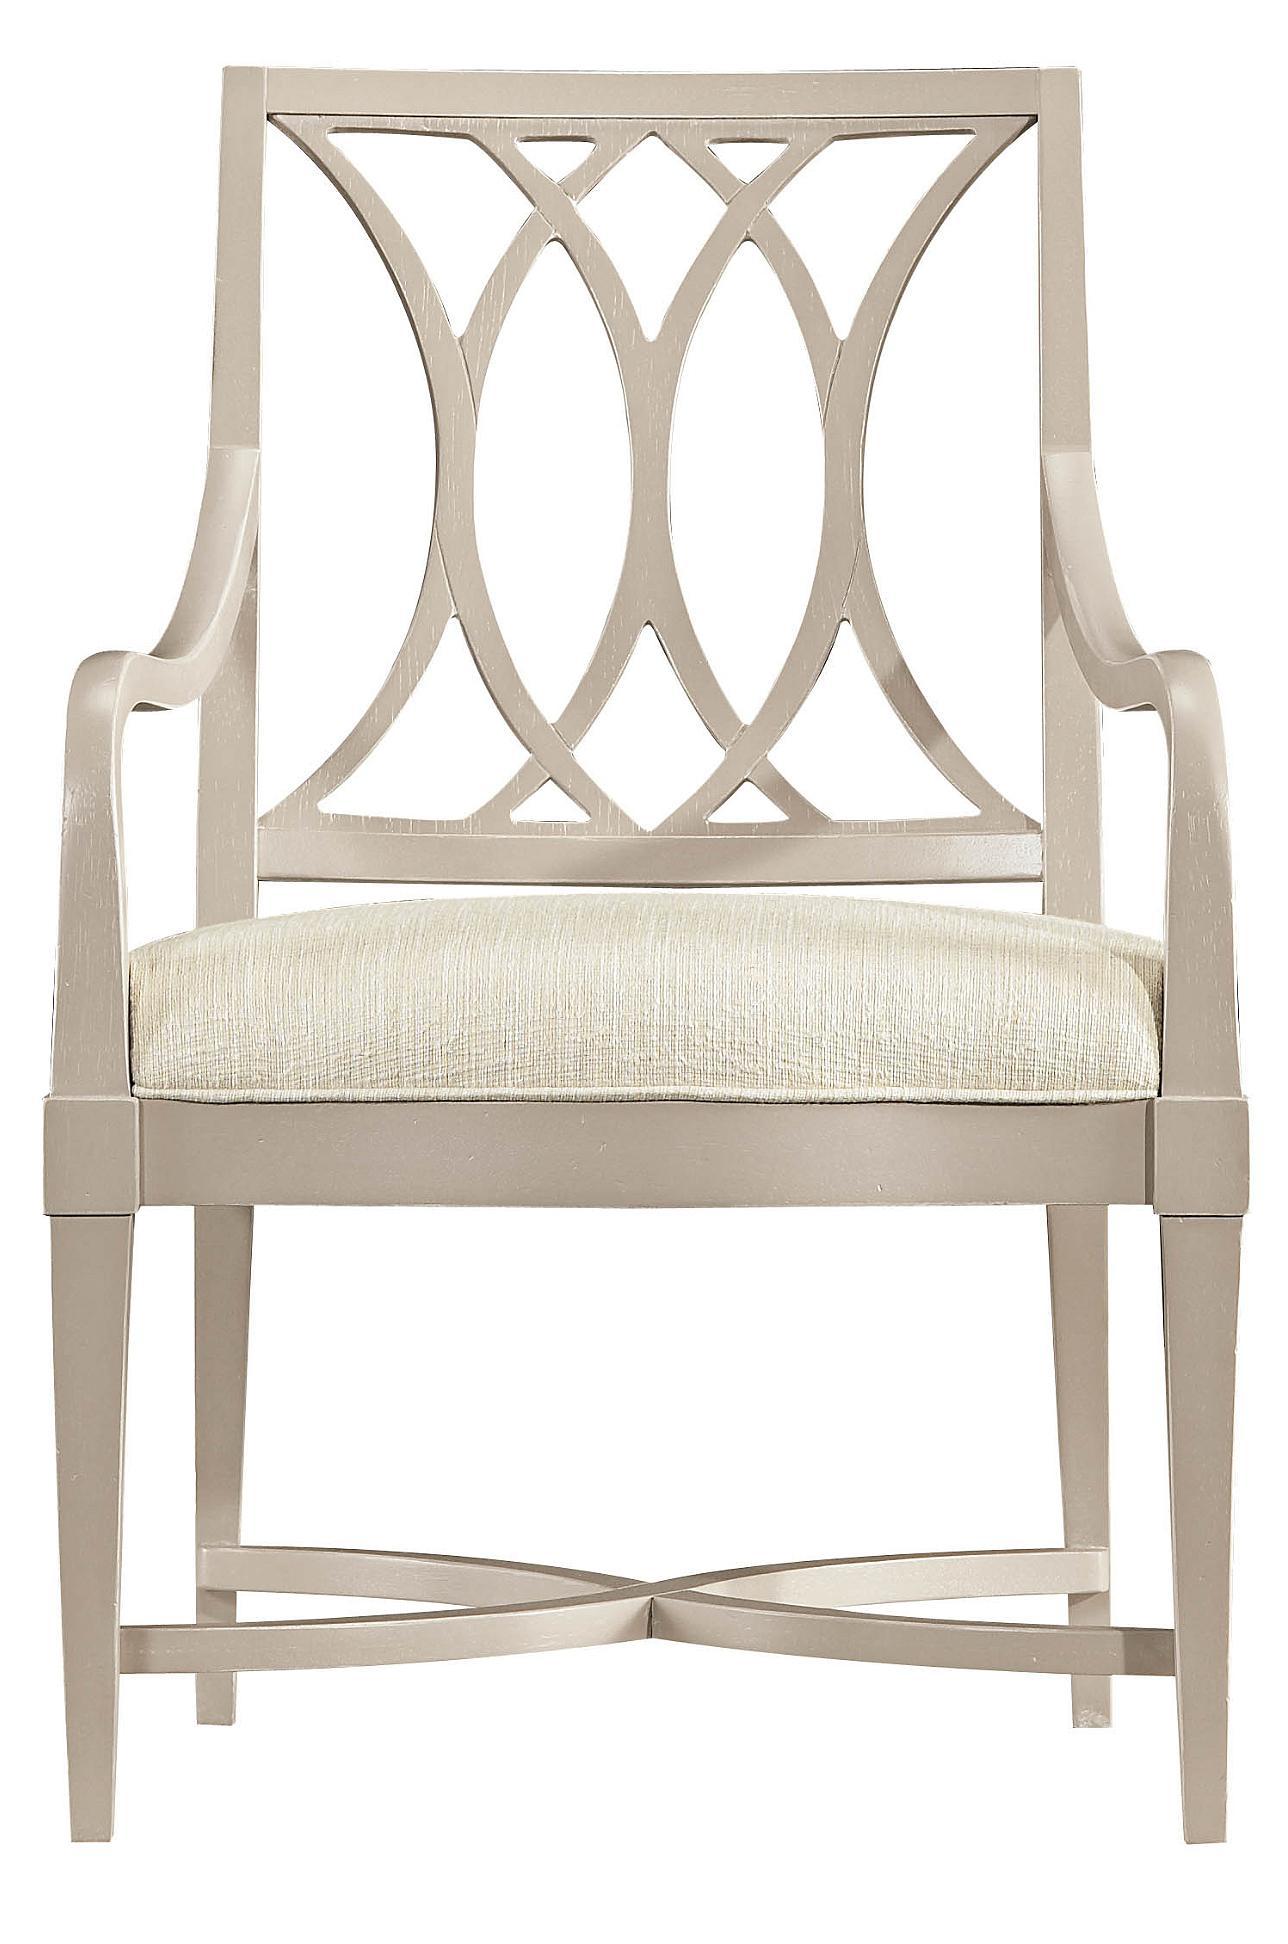 Stanley Furniture Coastal Living Resort Heritage Coast Arm Chair - Item Number: 062-D1-70